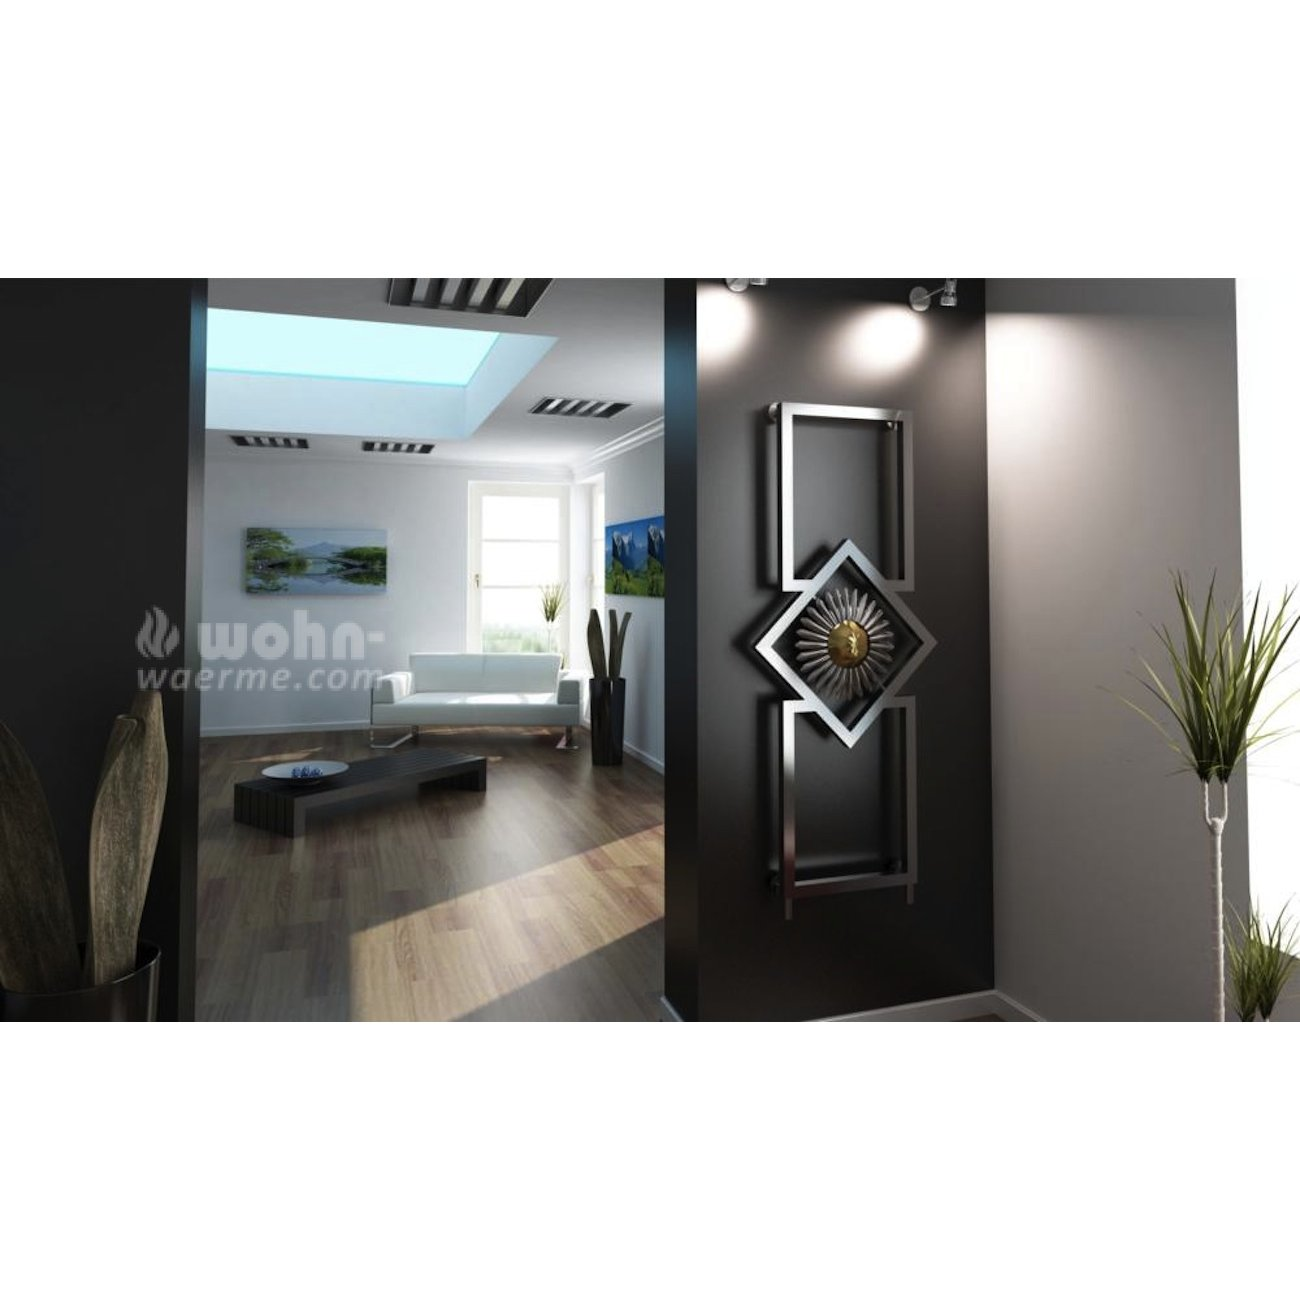 beautiful design heizk rper k che ideas house design. Black Bedroom Furniture Sets. Home Design Ideas